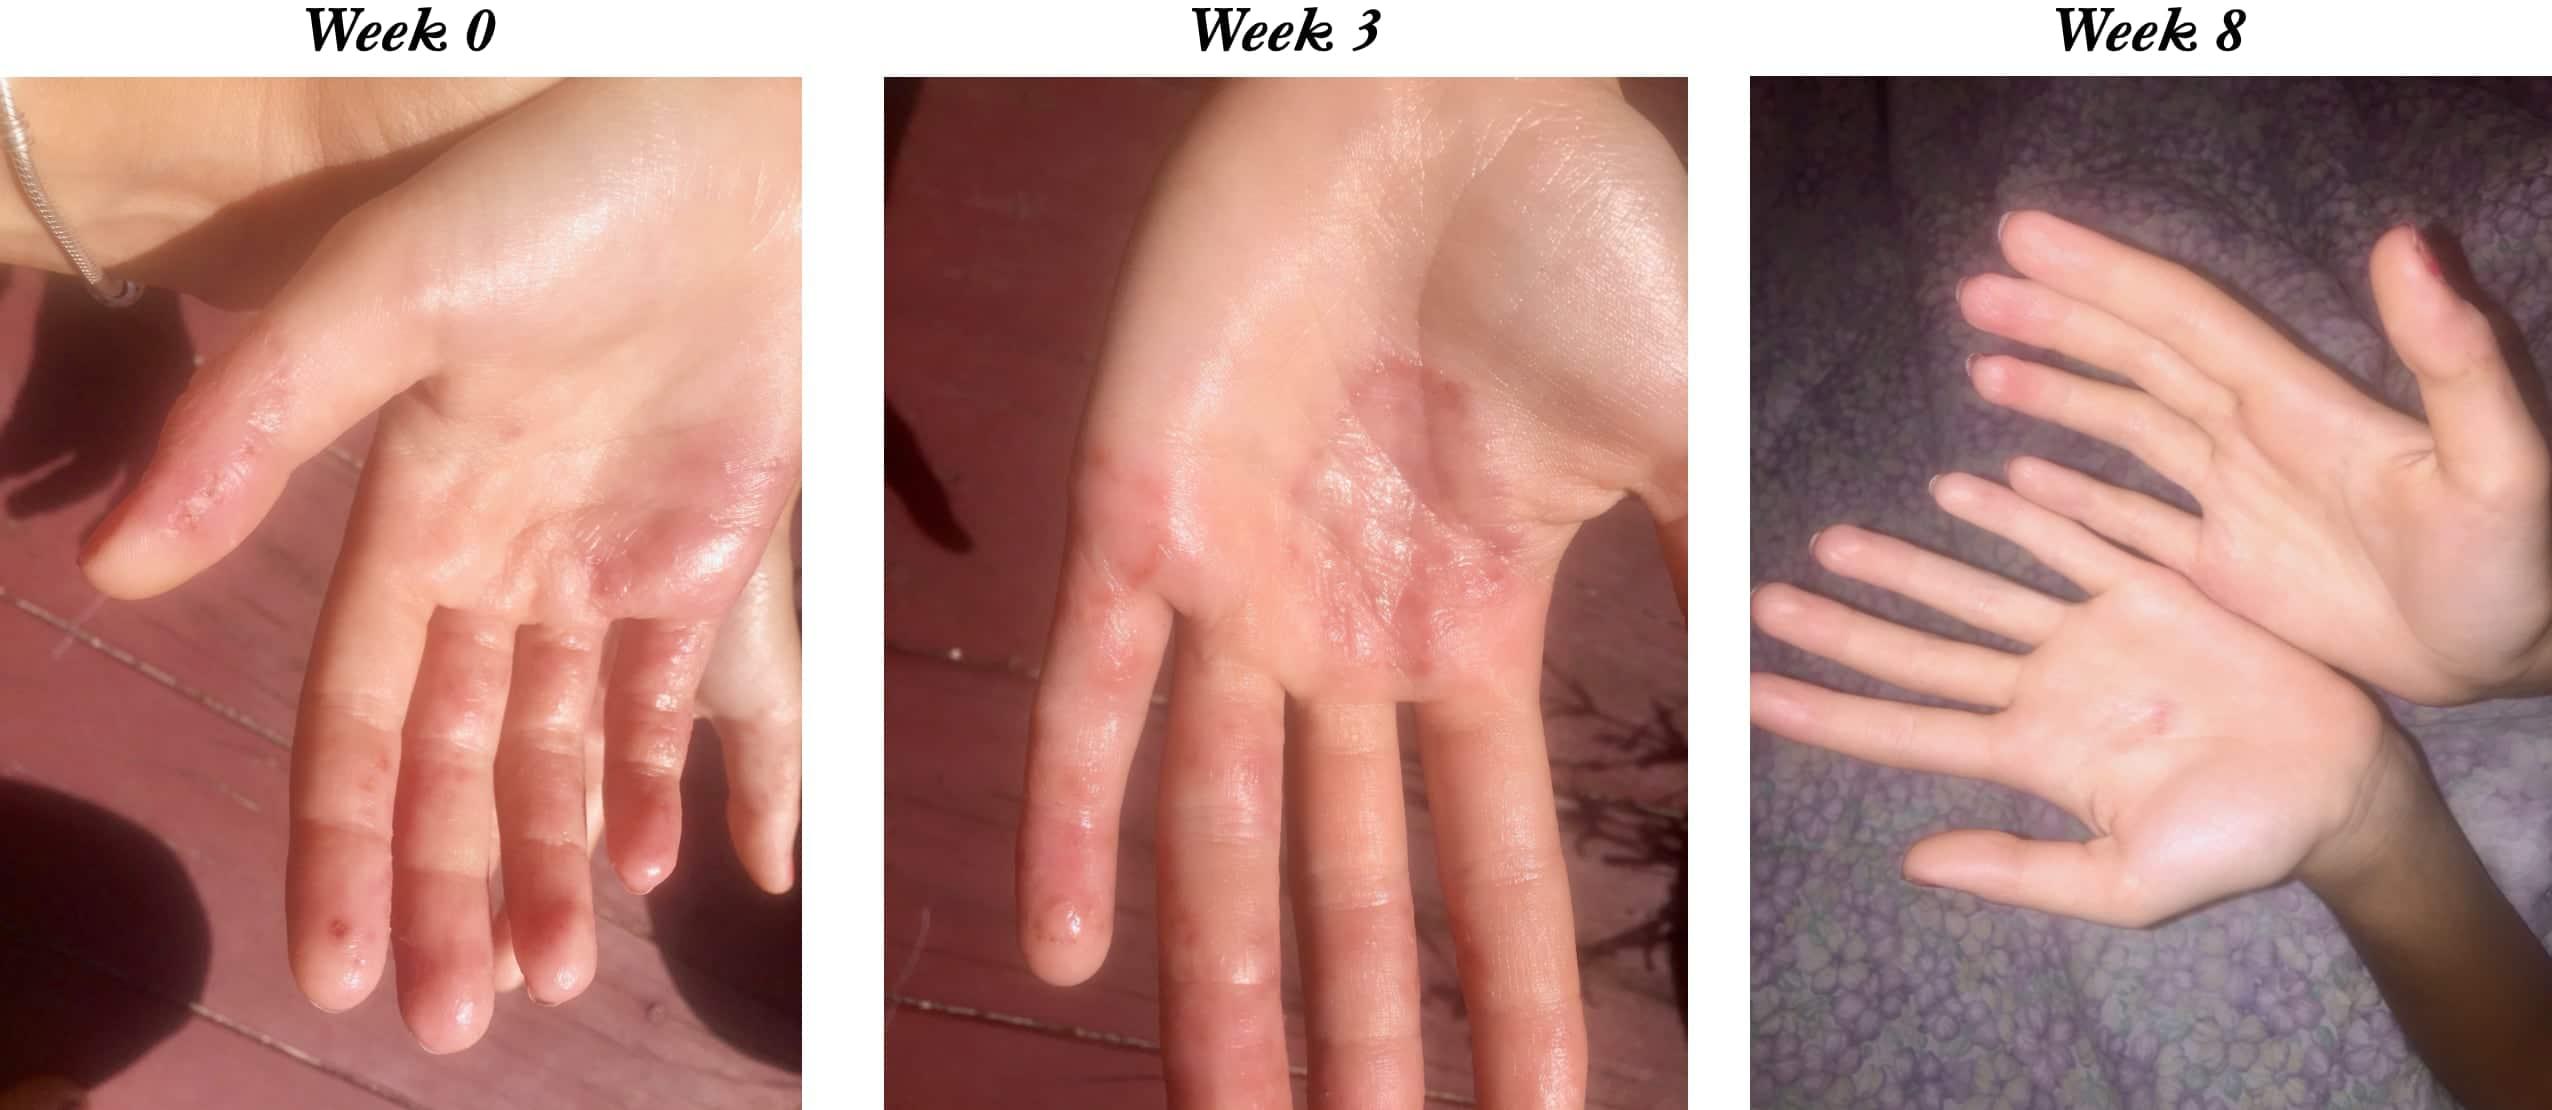 Eczema Result